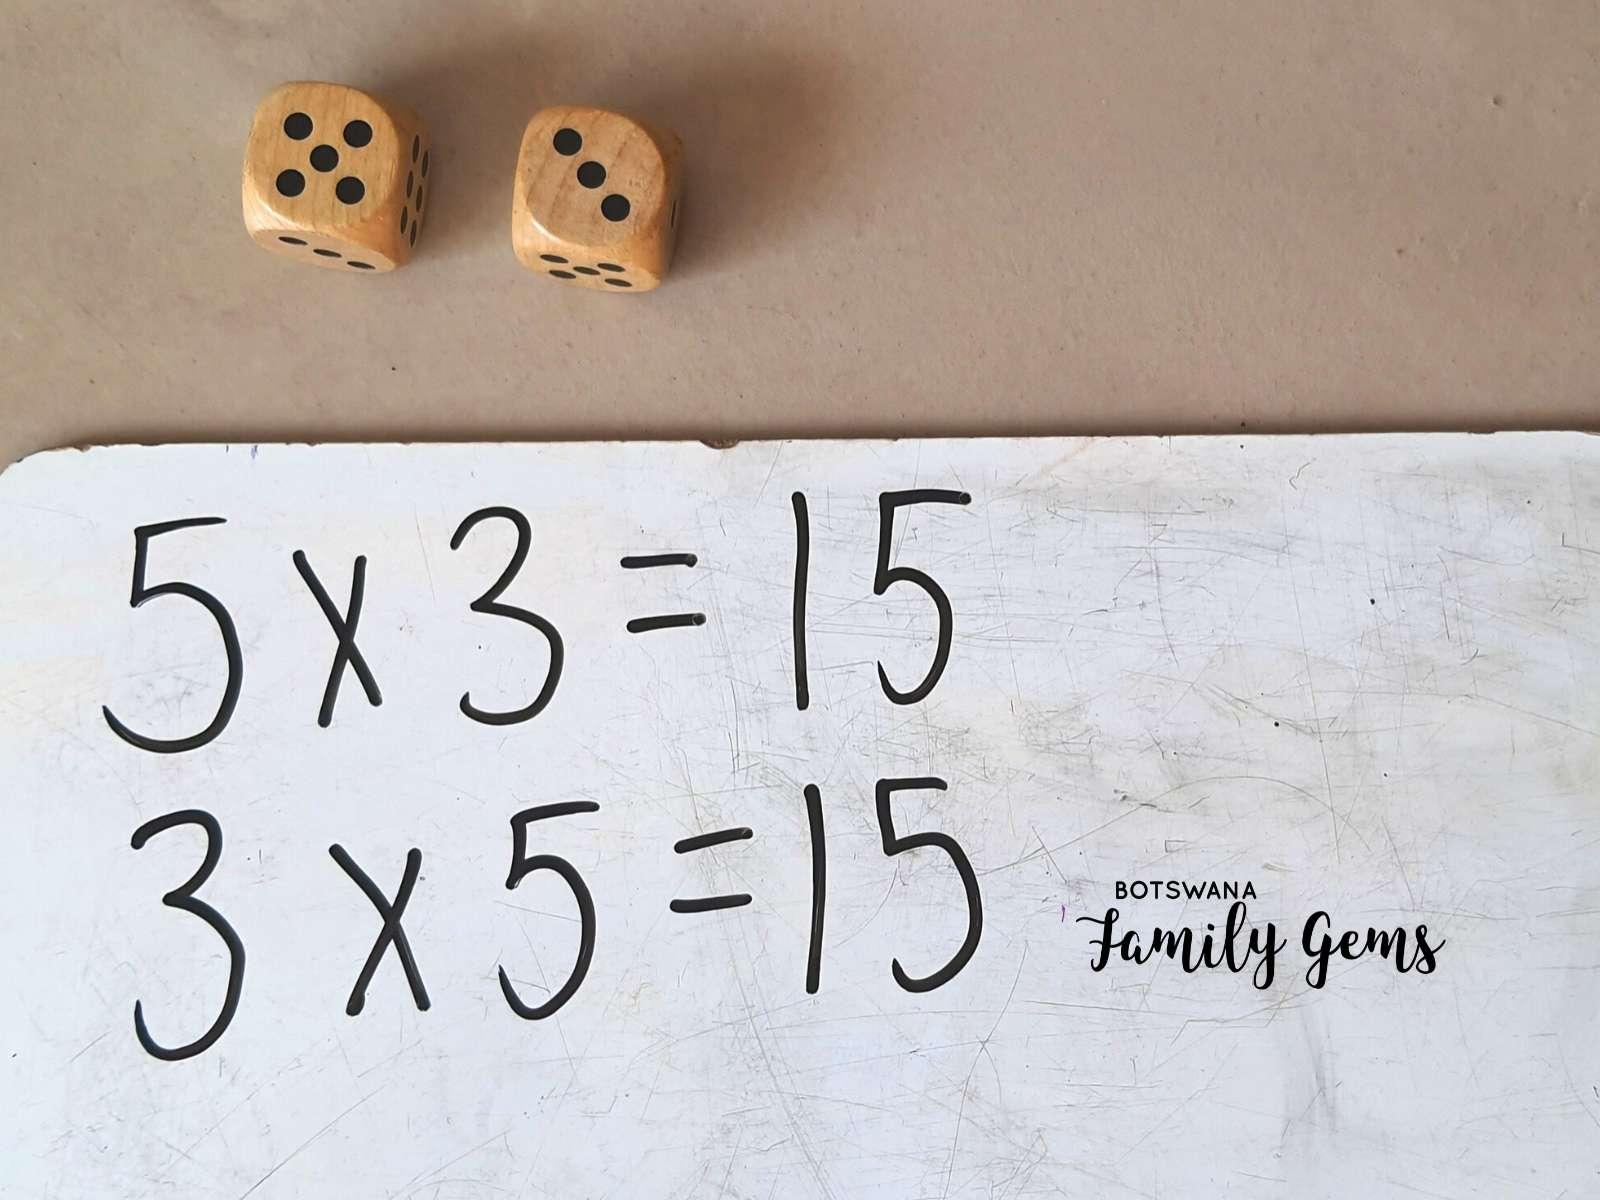 Educational maths games for Botswana lockdown